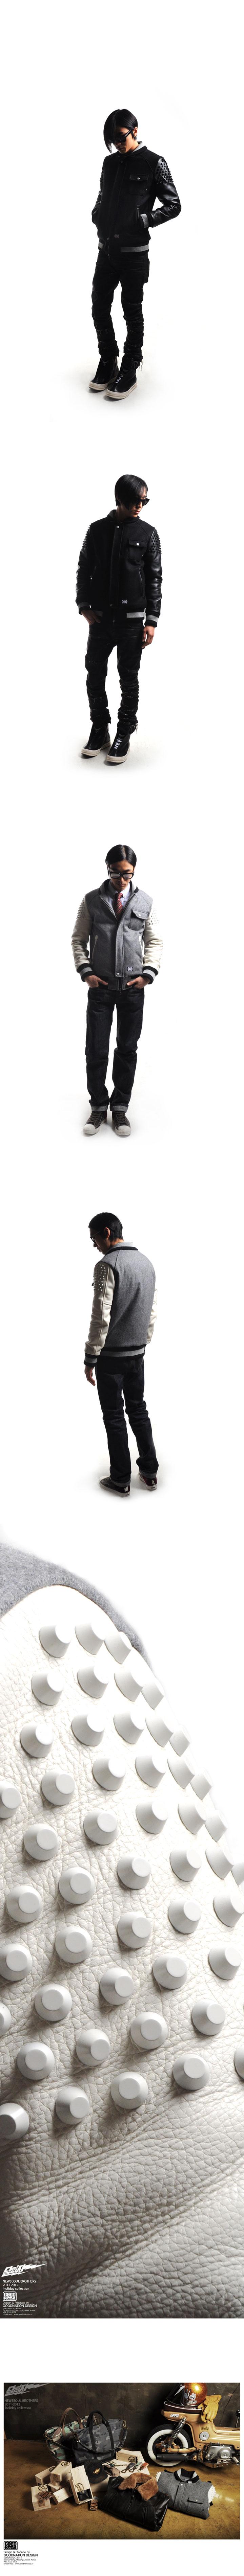 NSB 2011-2012 하이퍼 스터디럭스 자켓 발매